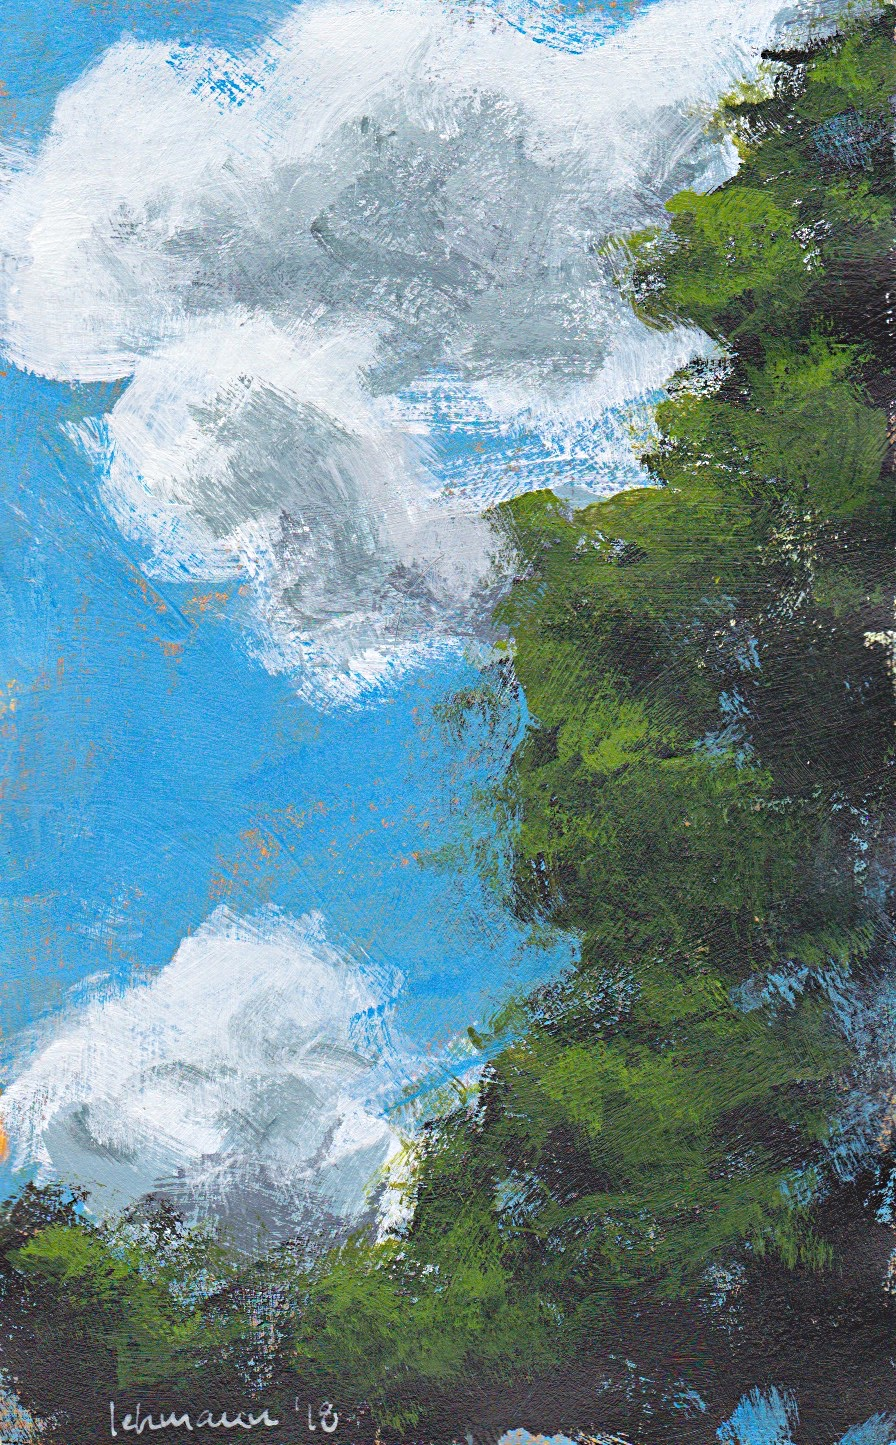 Minimalist art semi abstract landscape acrylic on paper Denmark Hreskoven